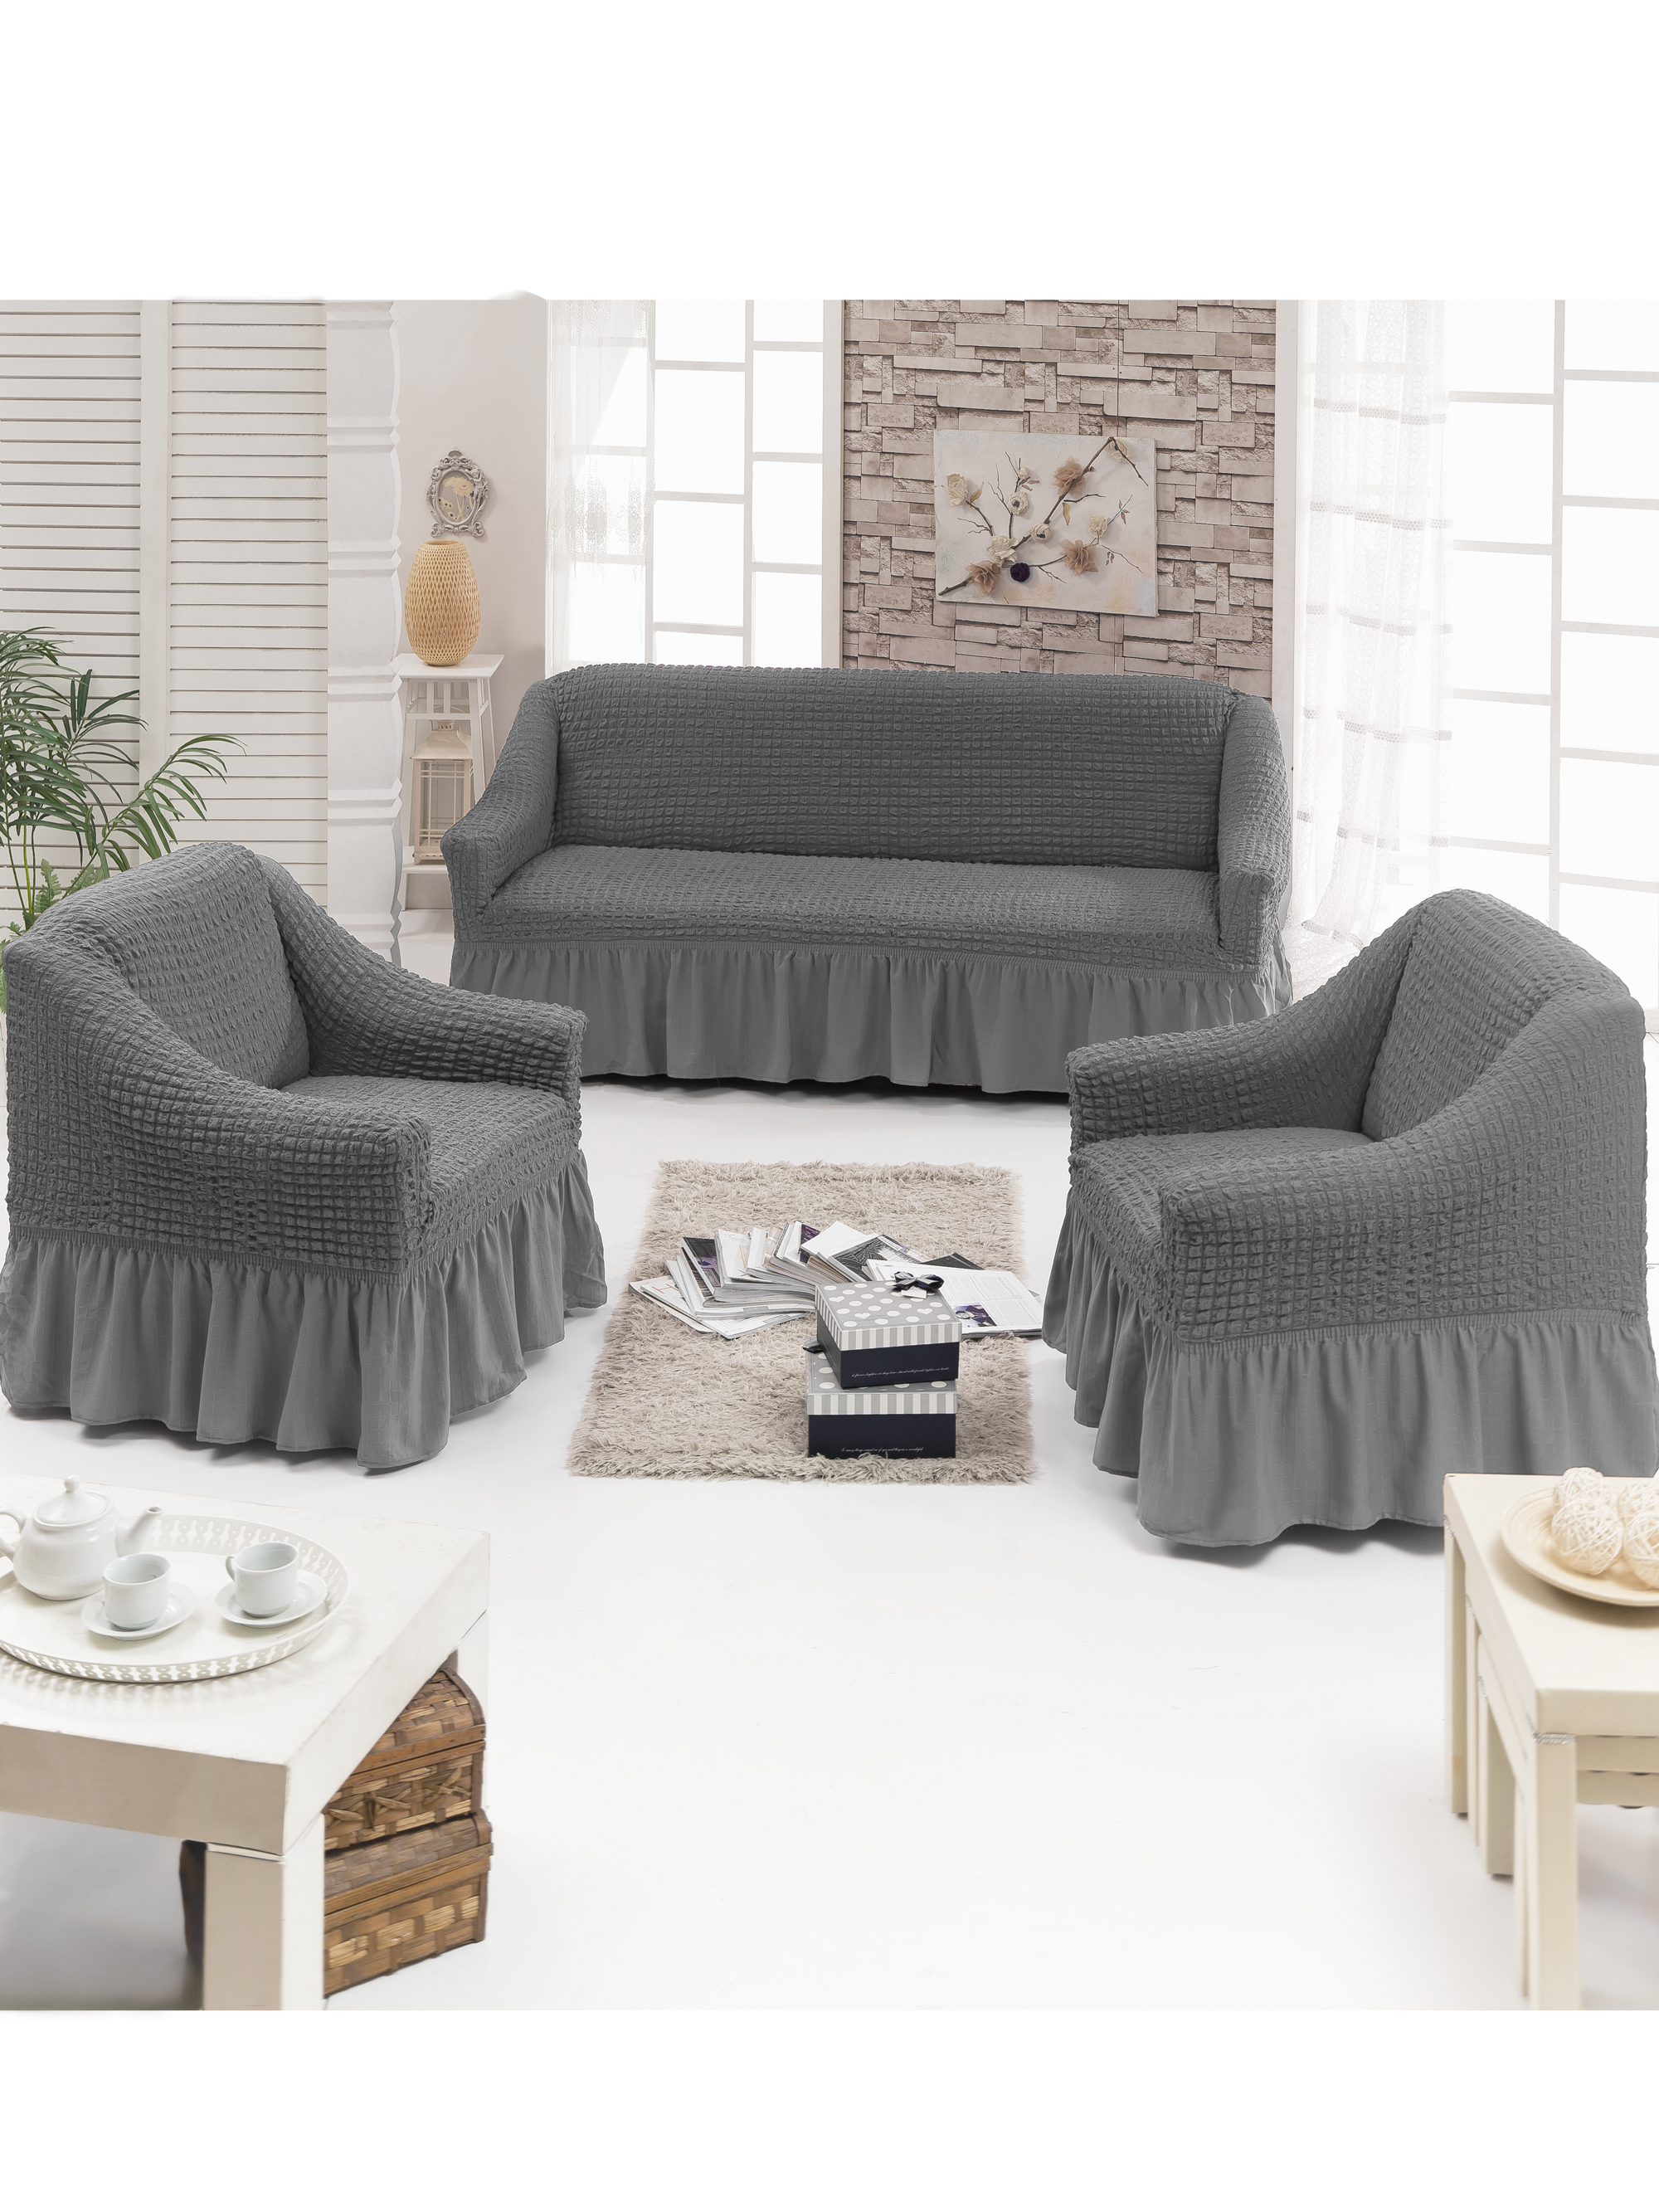 Чехол на мебель JUANNA Чехол д/мягкой мебели 3-х пр.(3+1+1) JUANNA_серый, серый комплект мягкой мебели пульсар 3 3 1 1